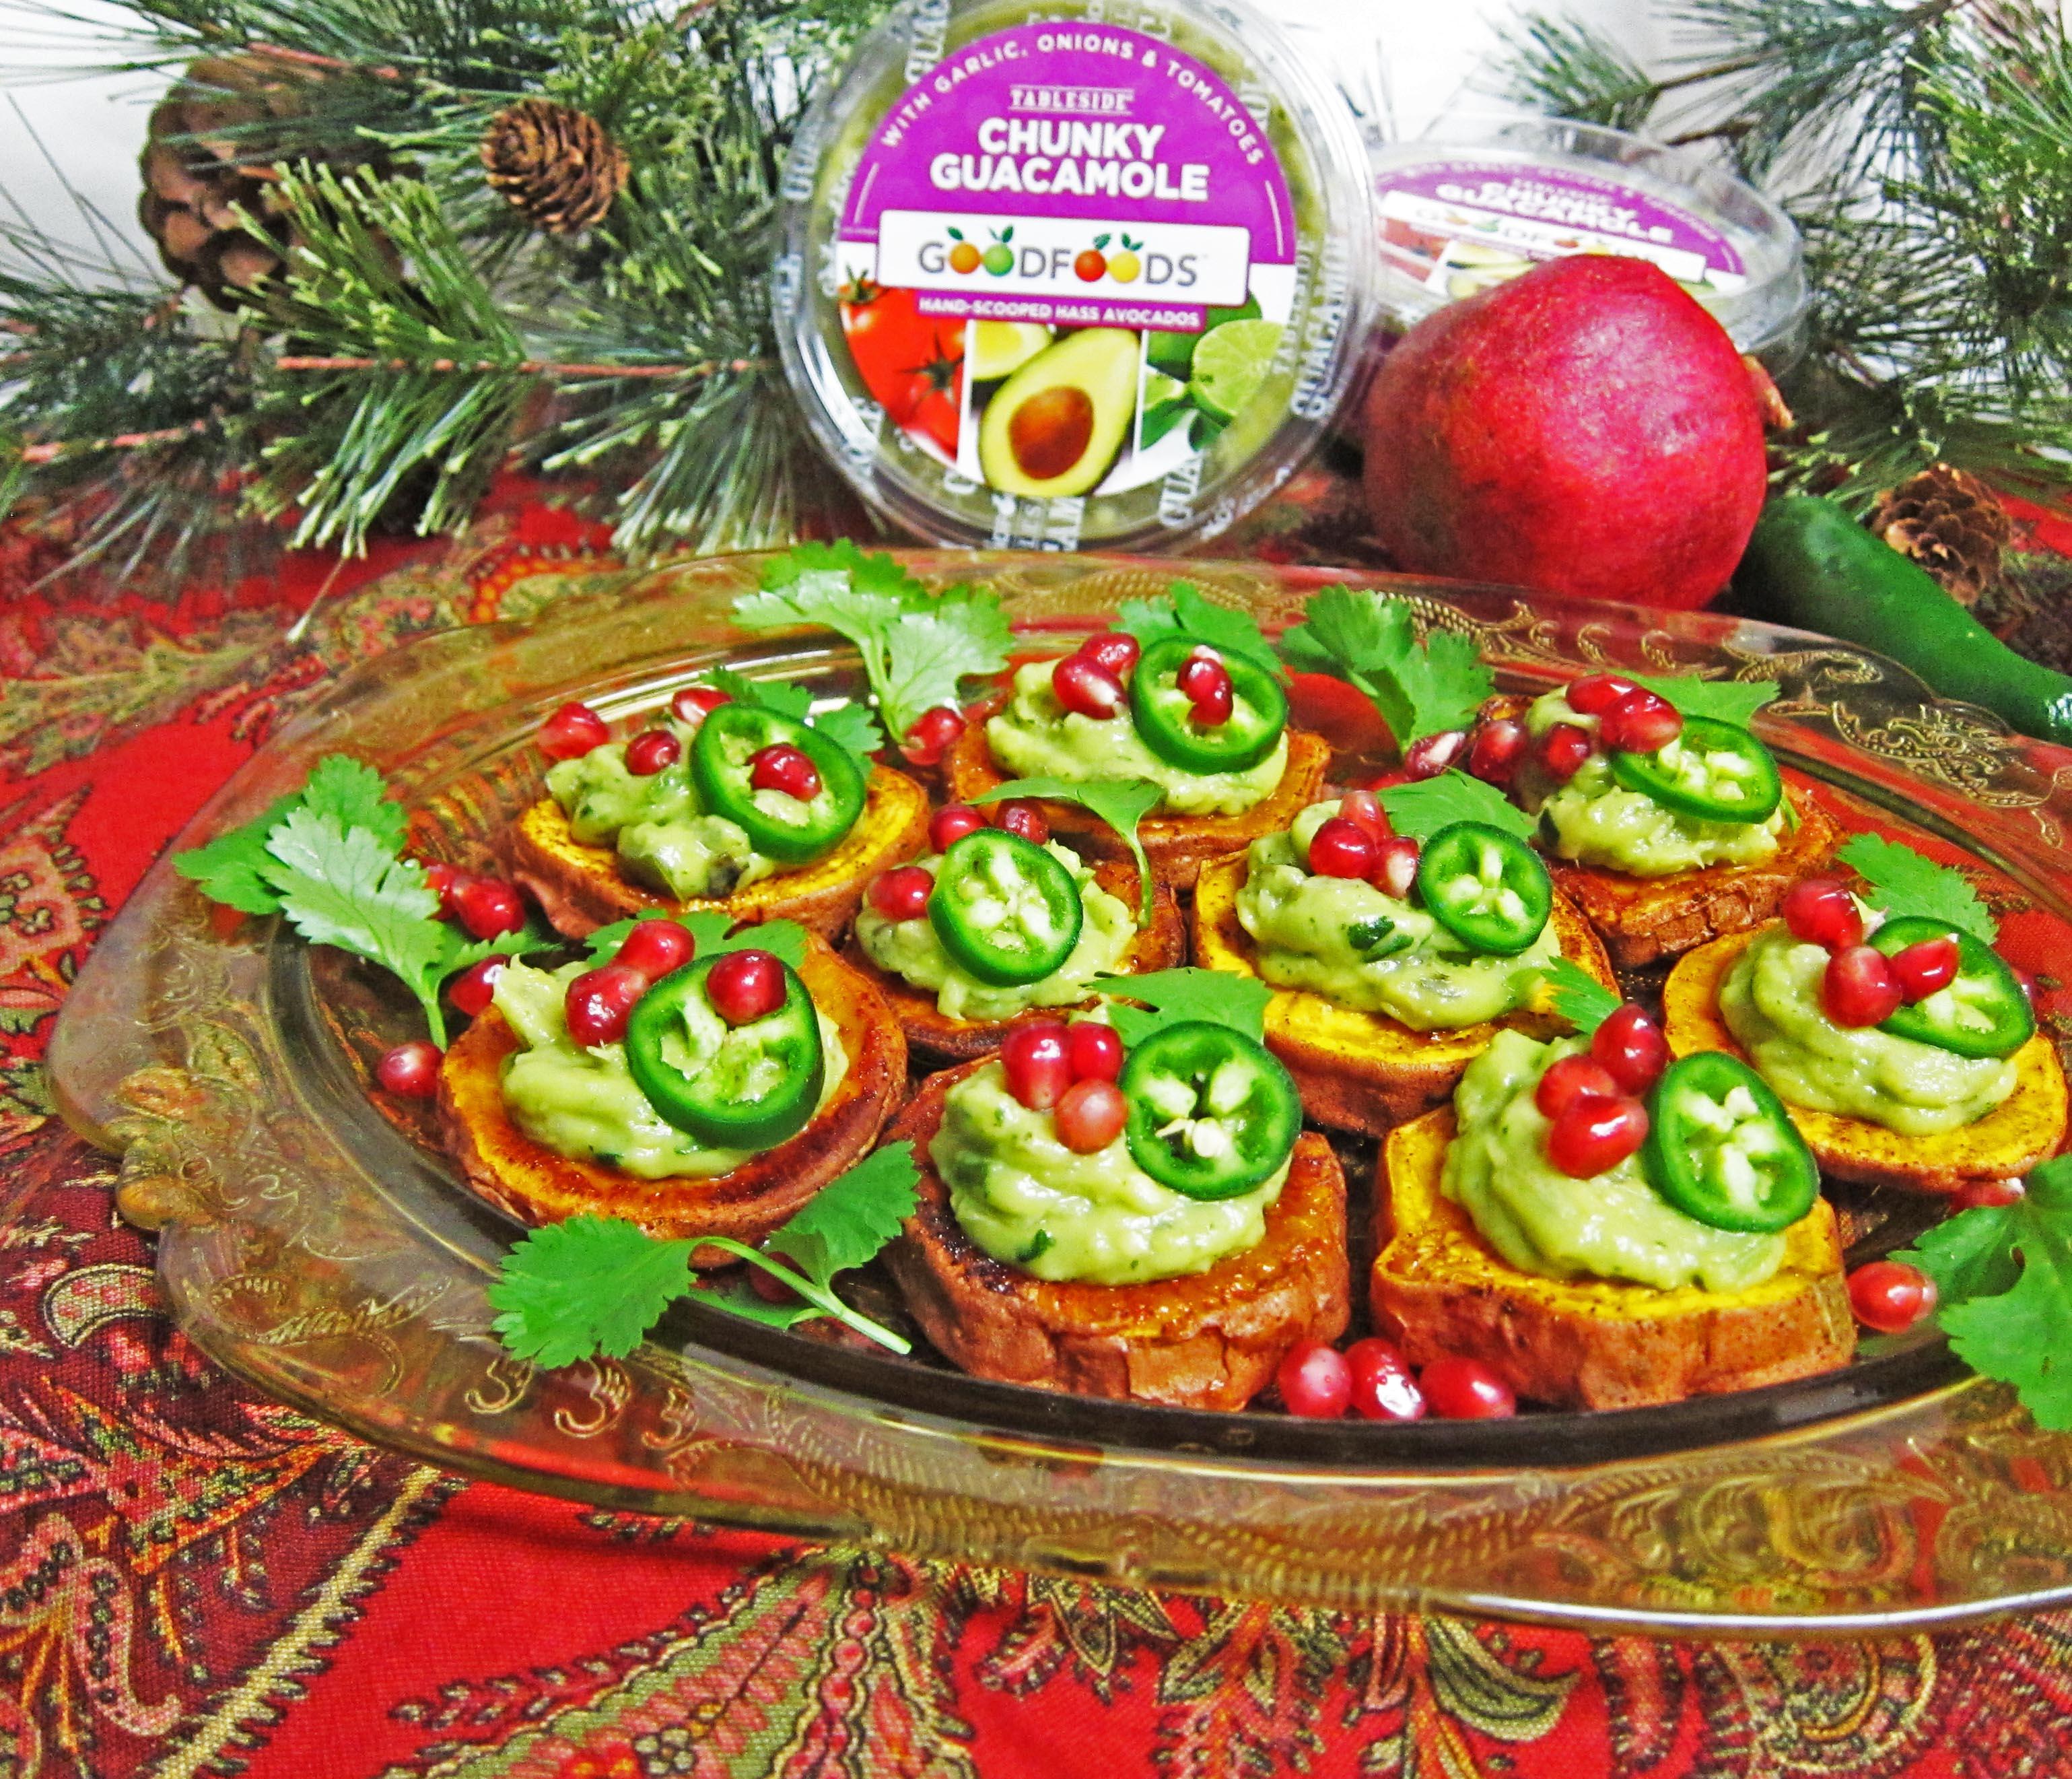 Holiday Entertaining! Mini Sweet Potato Avocado Crostini and GOODFOODS Guacamole